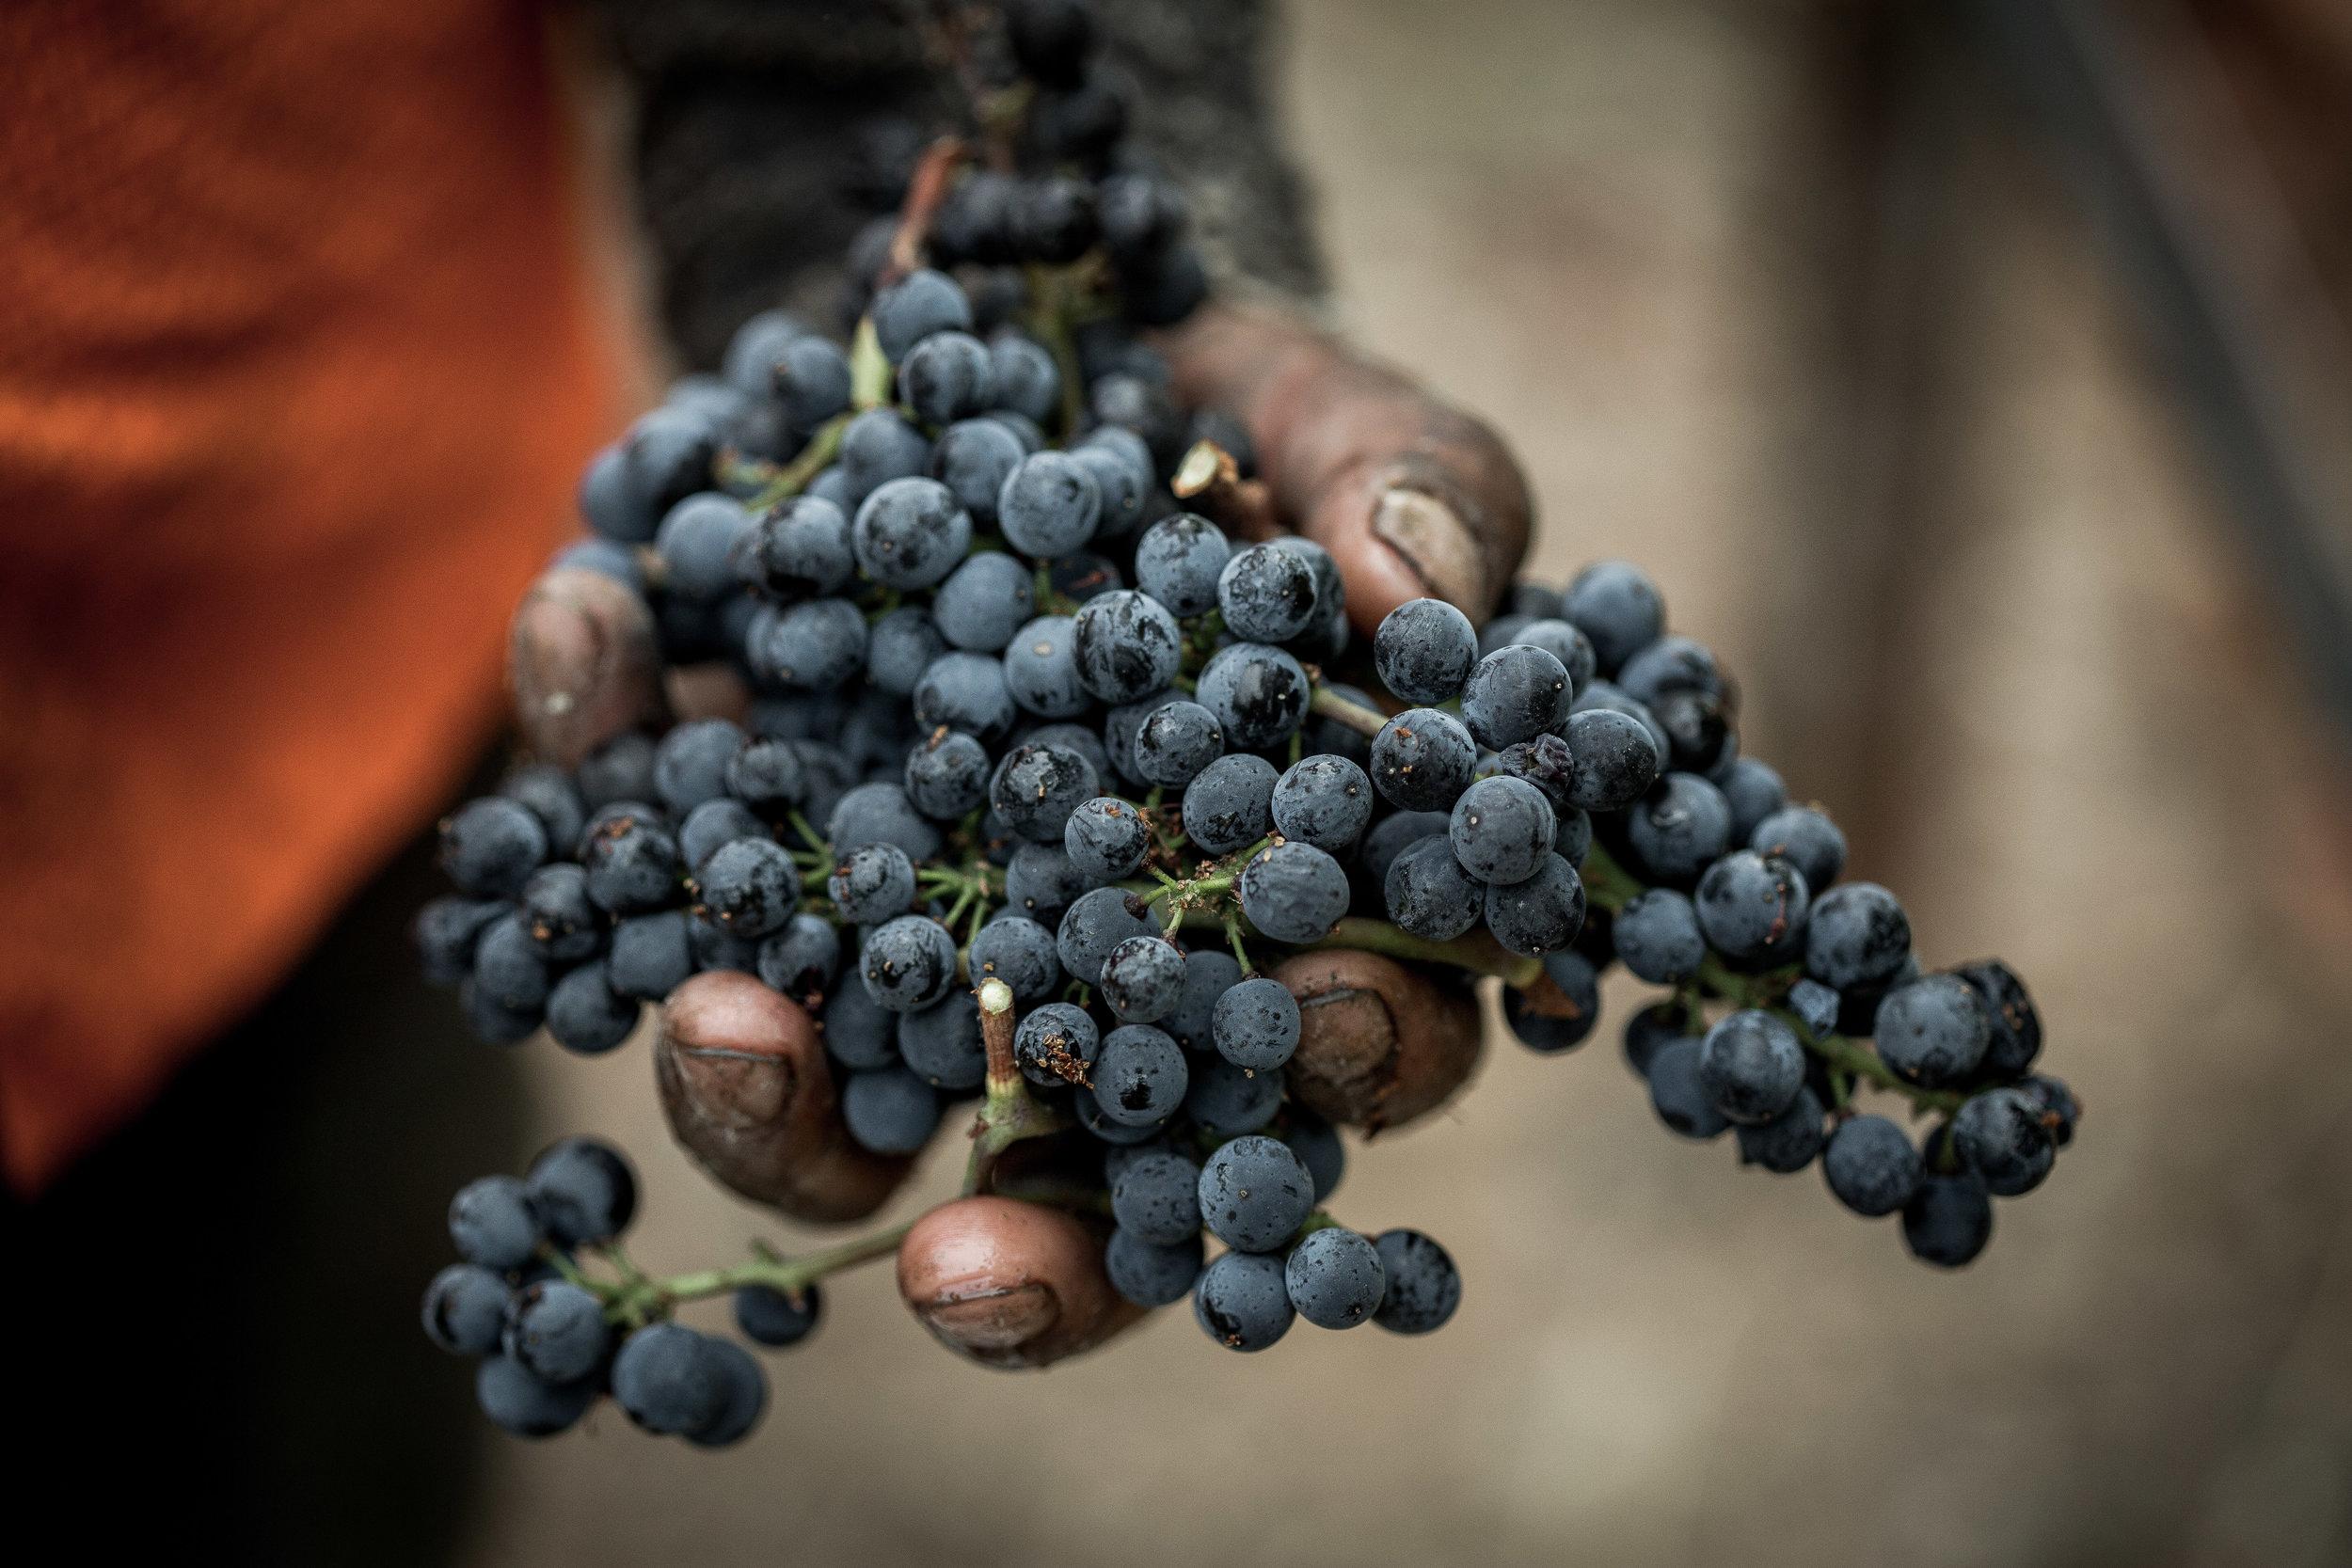 Arista Winery 2016 Russian River Valley, Sonoma